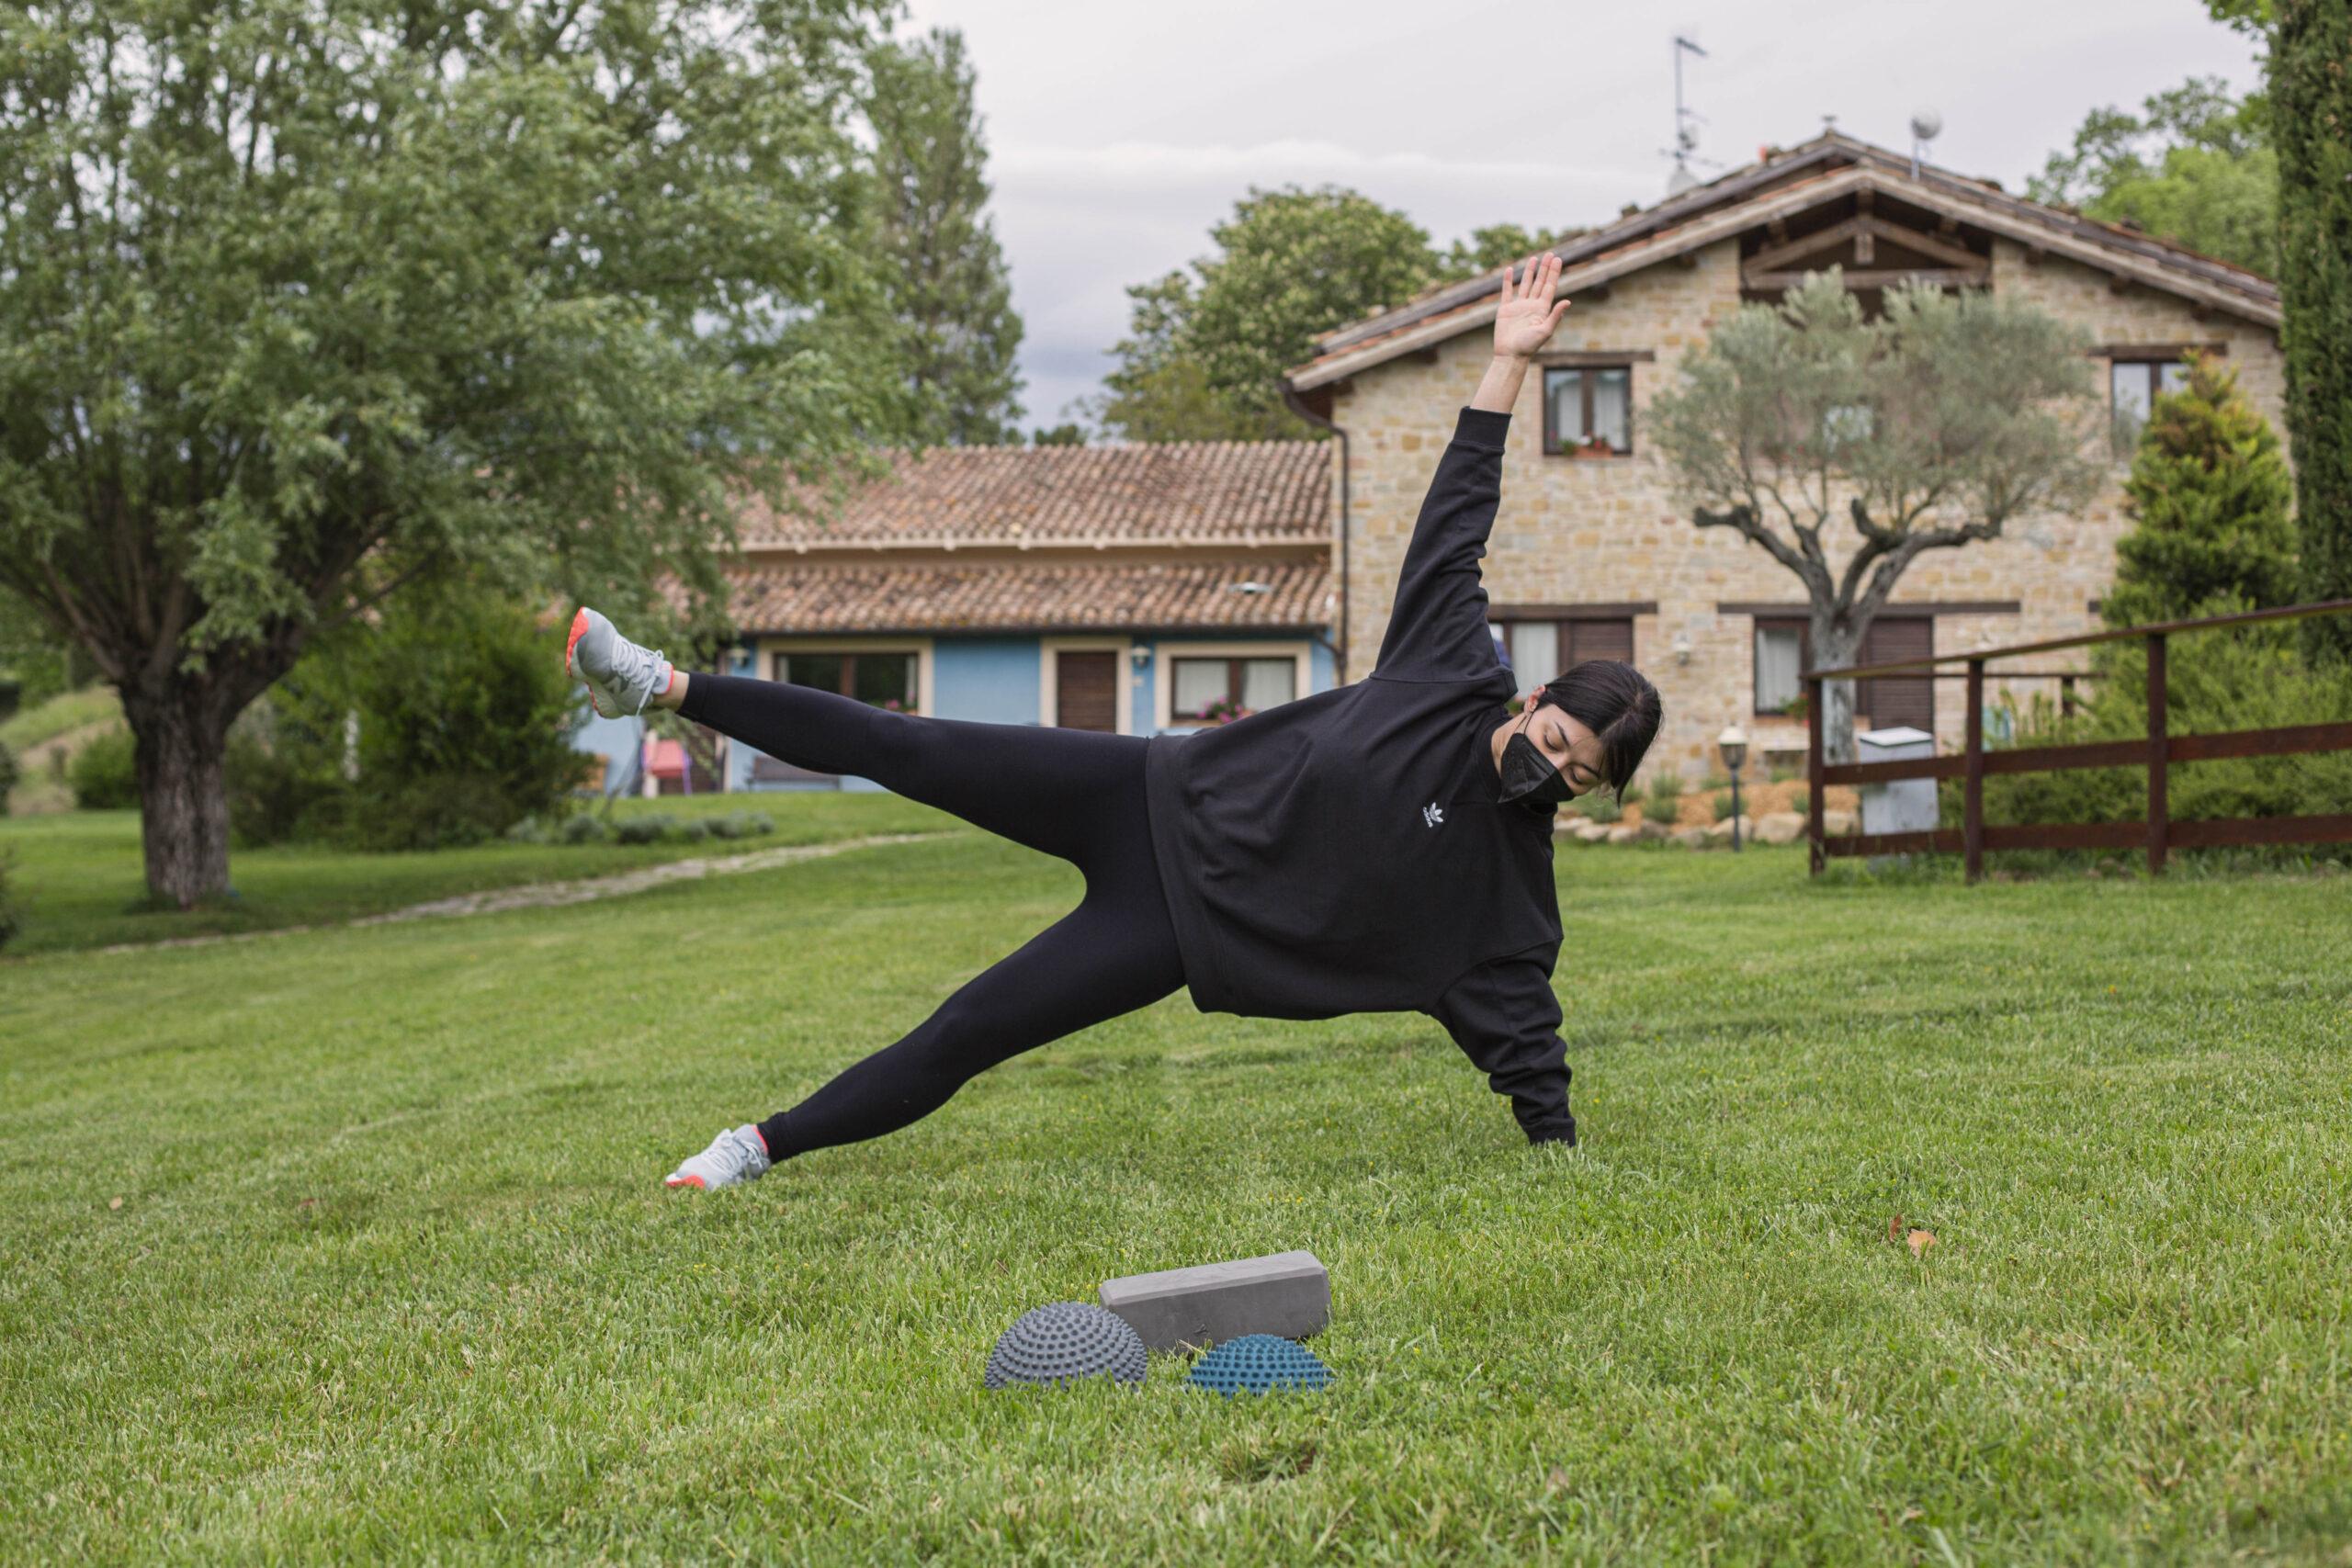 Get your balance camerino